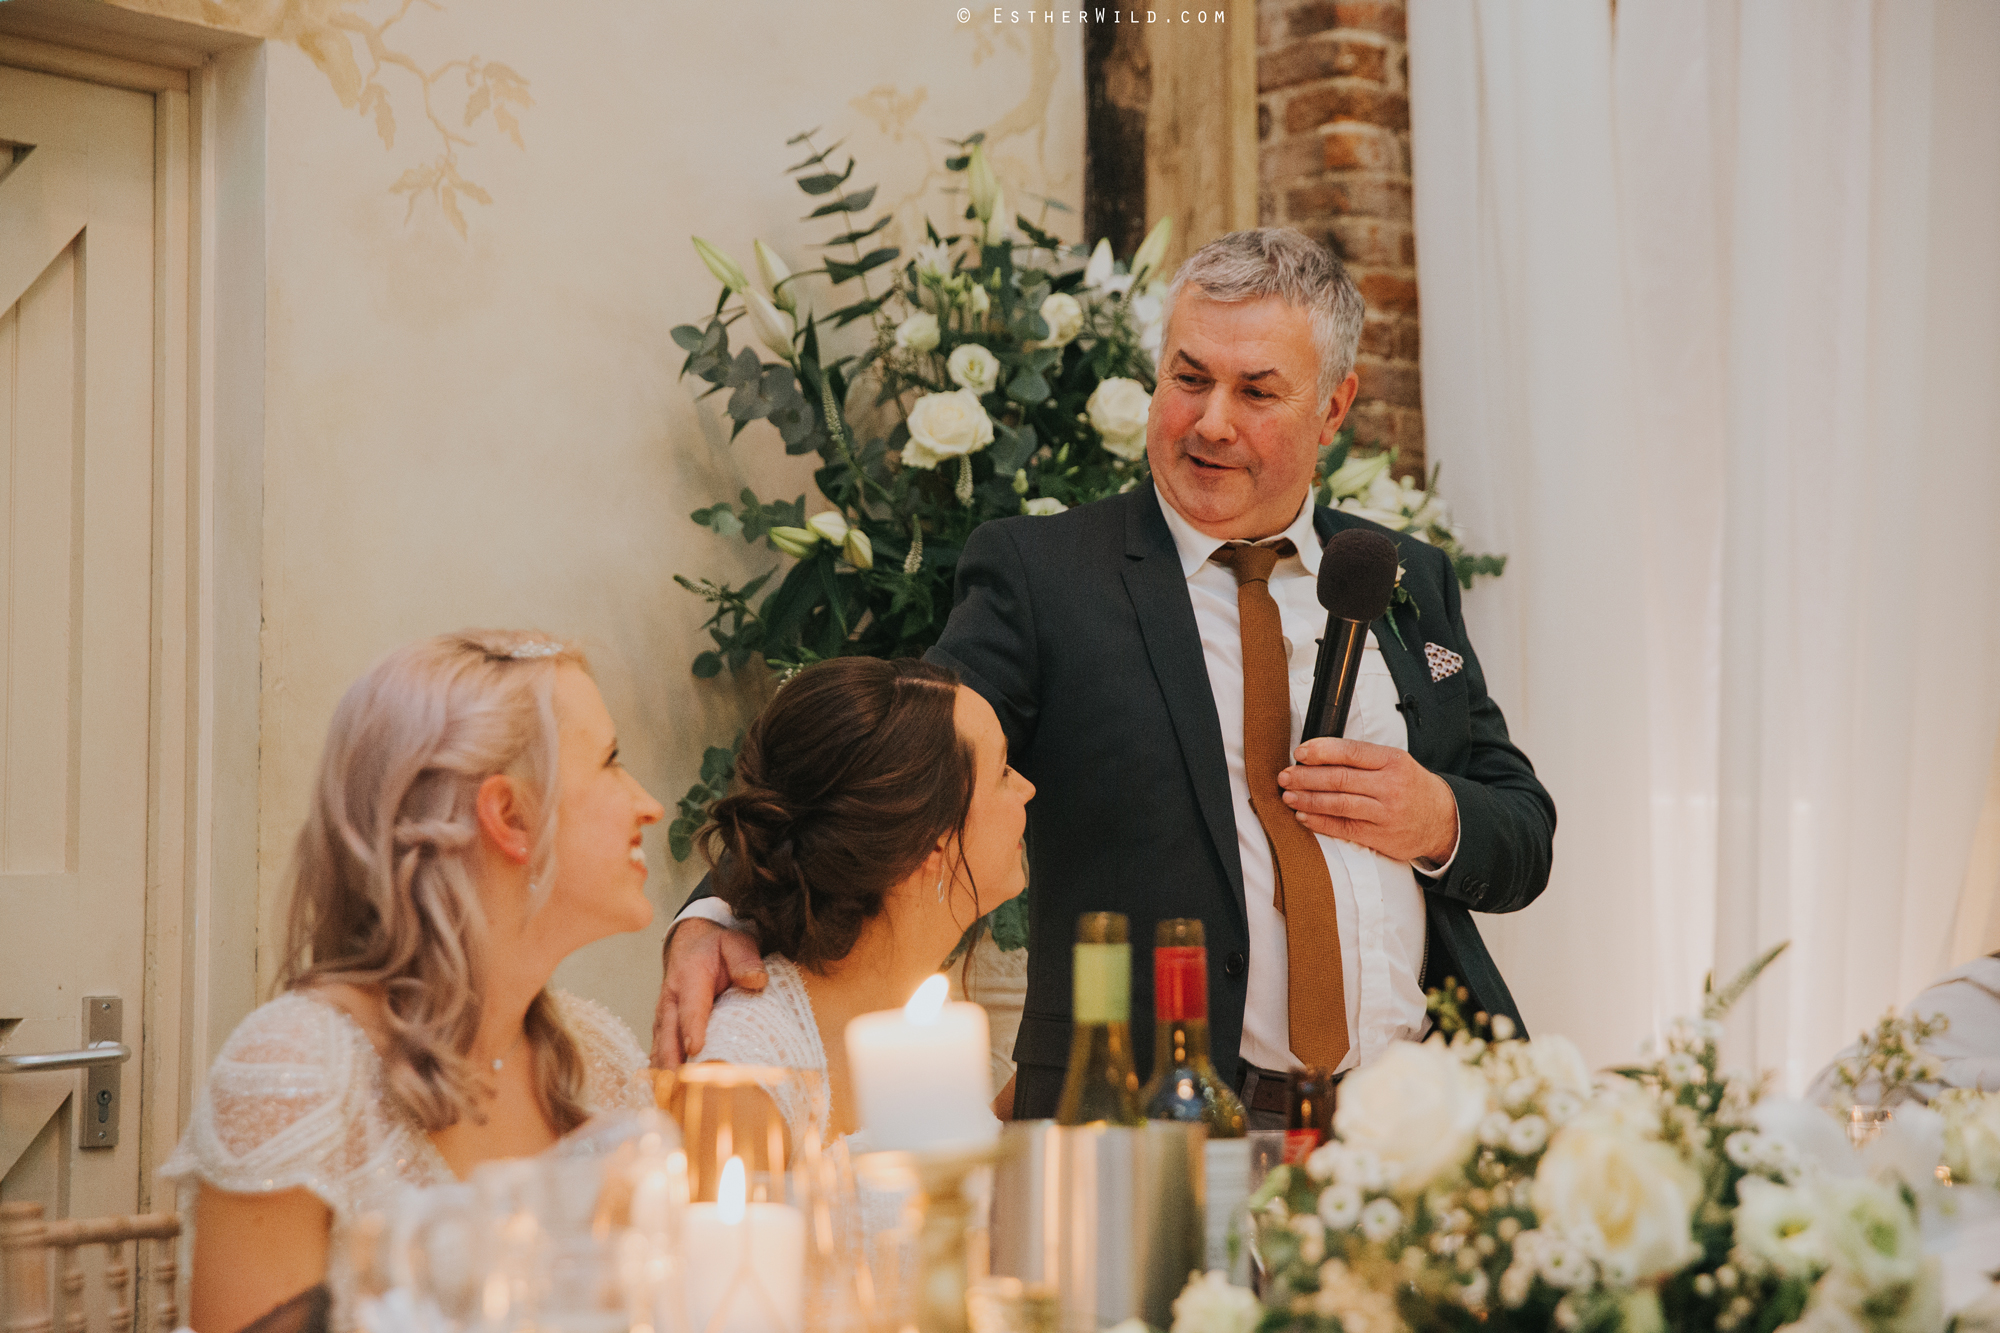 Elms_Barn_Weddings_Suffolk_Photographer_Copyright_Esther_Wild_IMG_2533.jpg